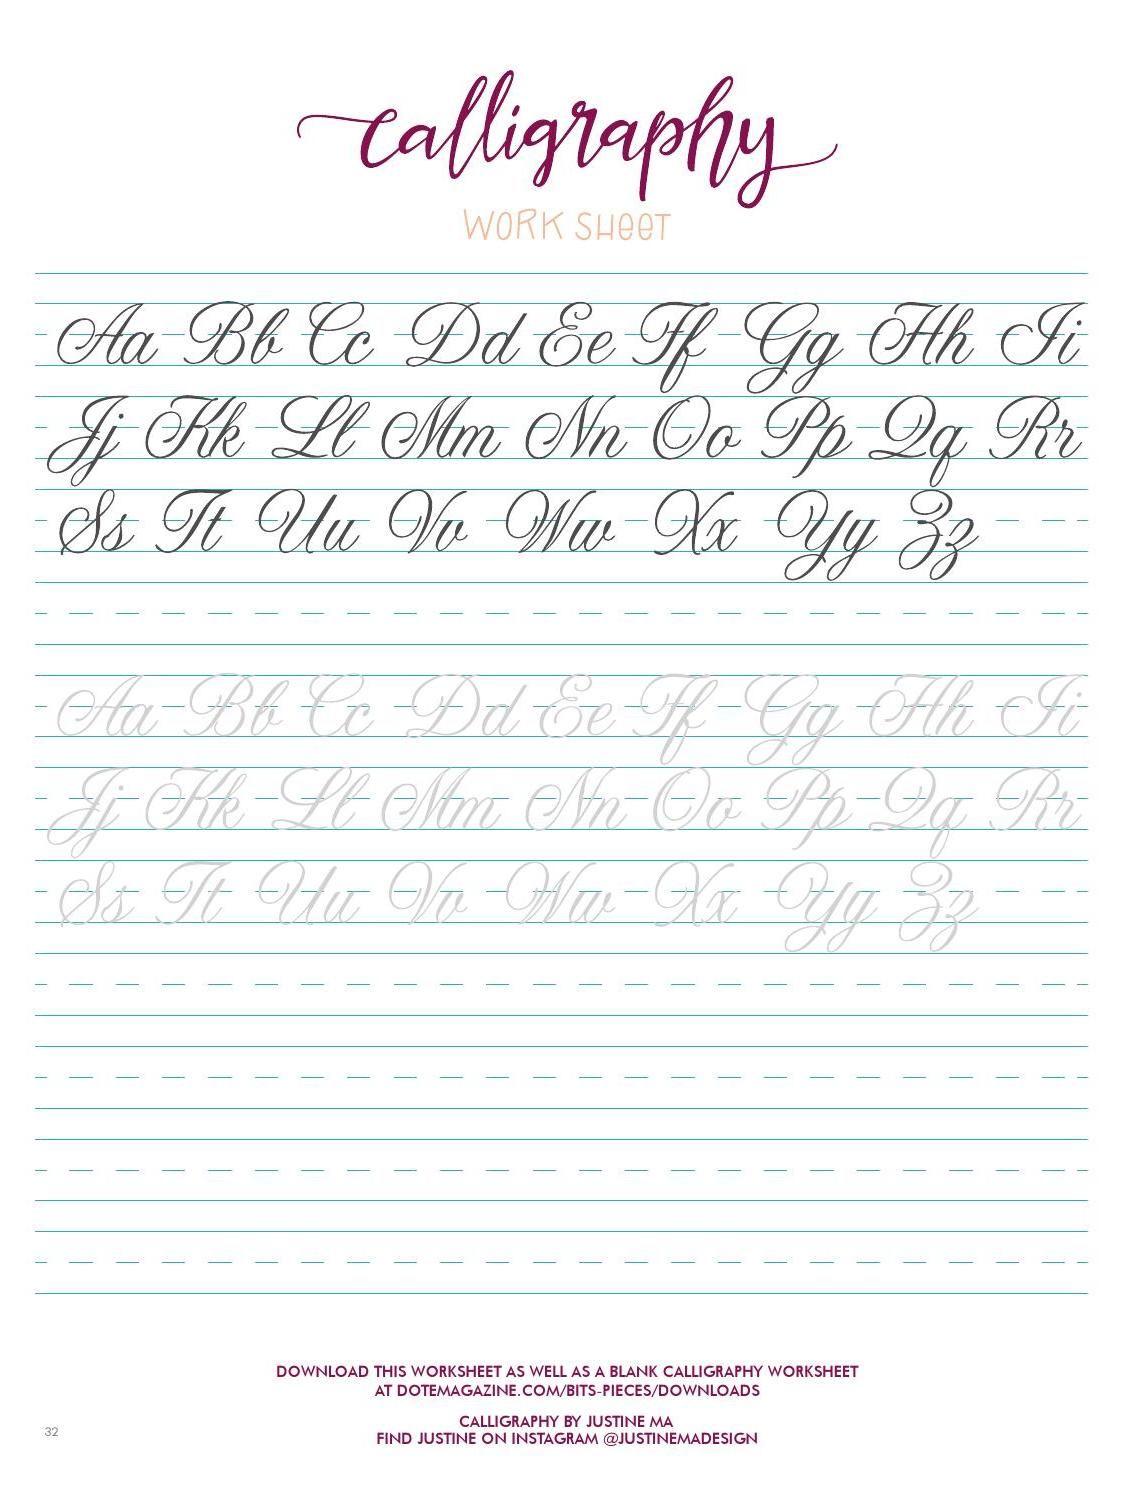 Dote Magazine Issue 2 Learn Hand Lettering Lettering Alphabet Hand Lettering Worksheet [ 1494 x 1141 Pixel ]